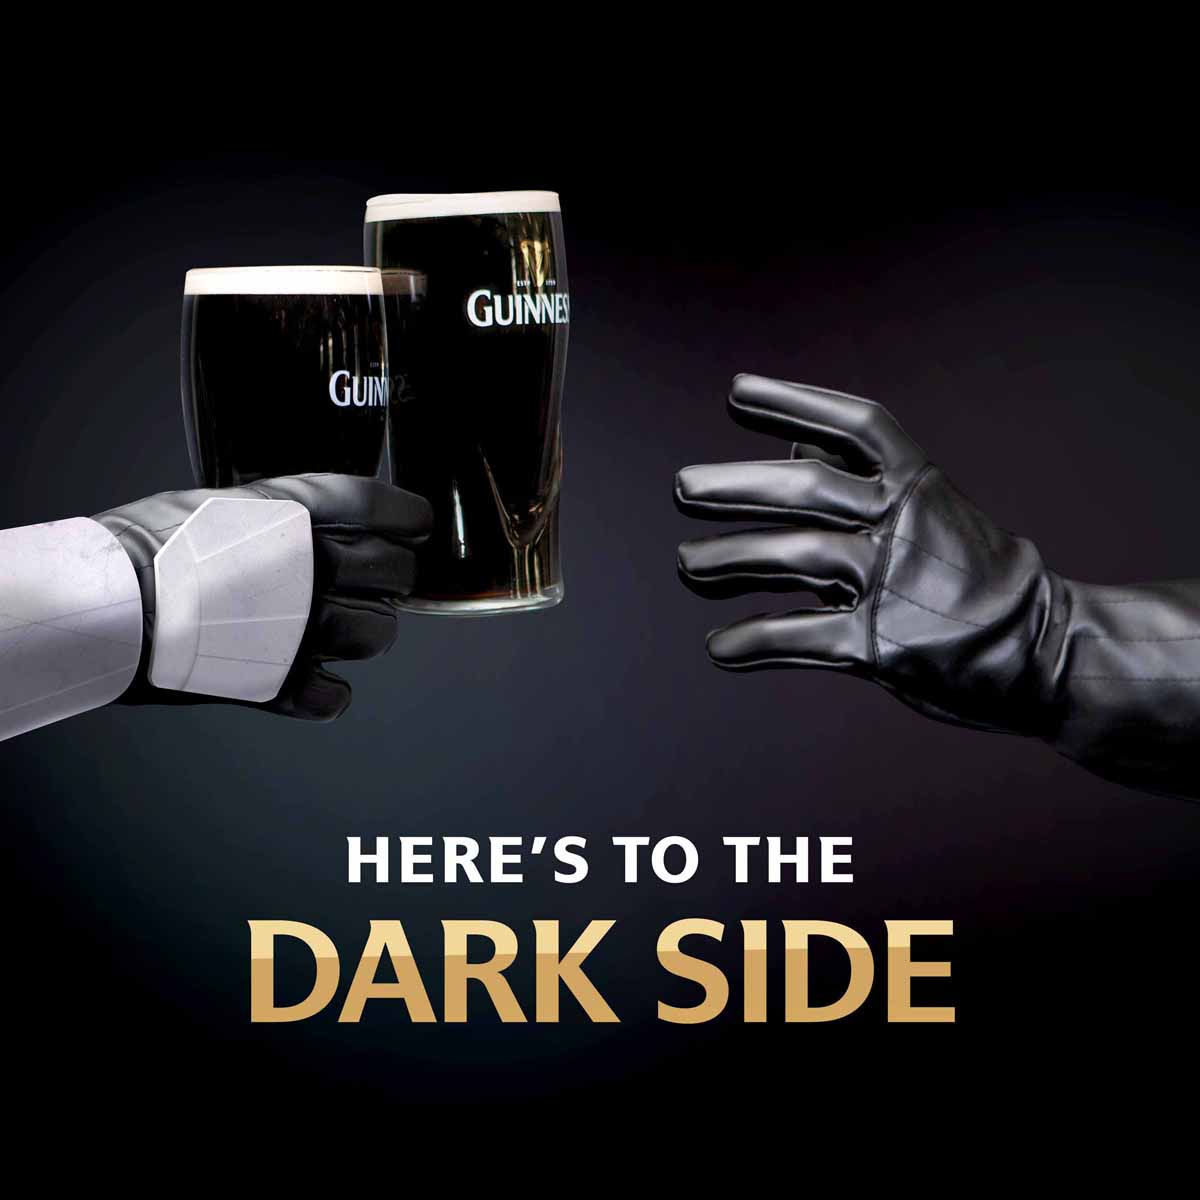 Star-Wars Guinness